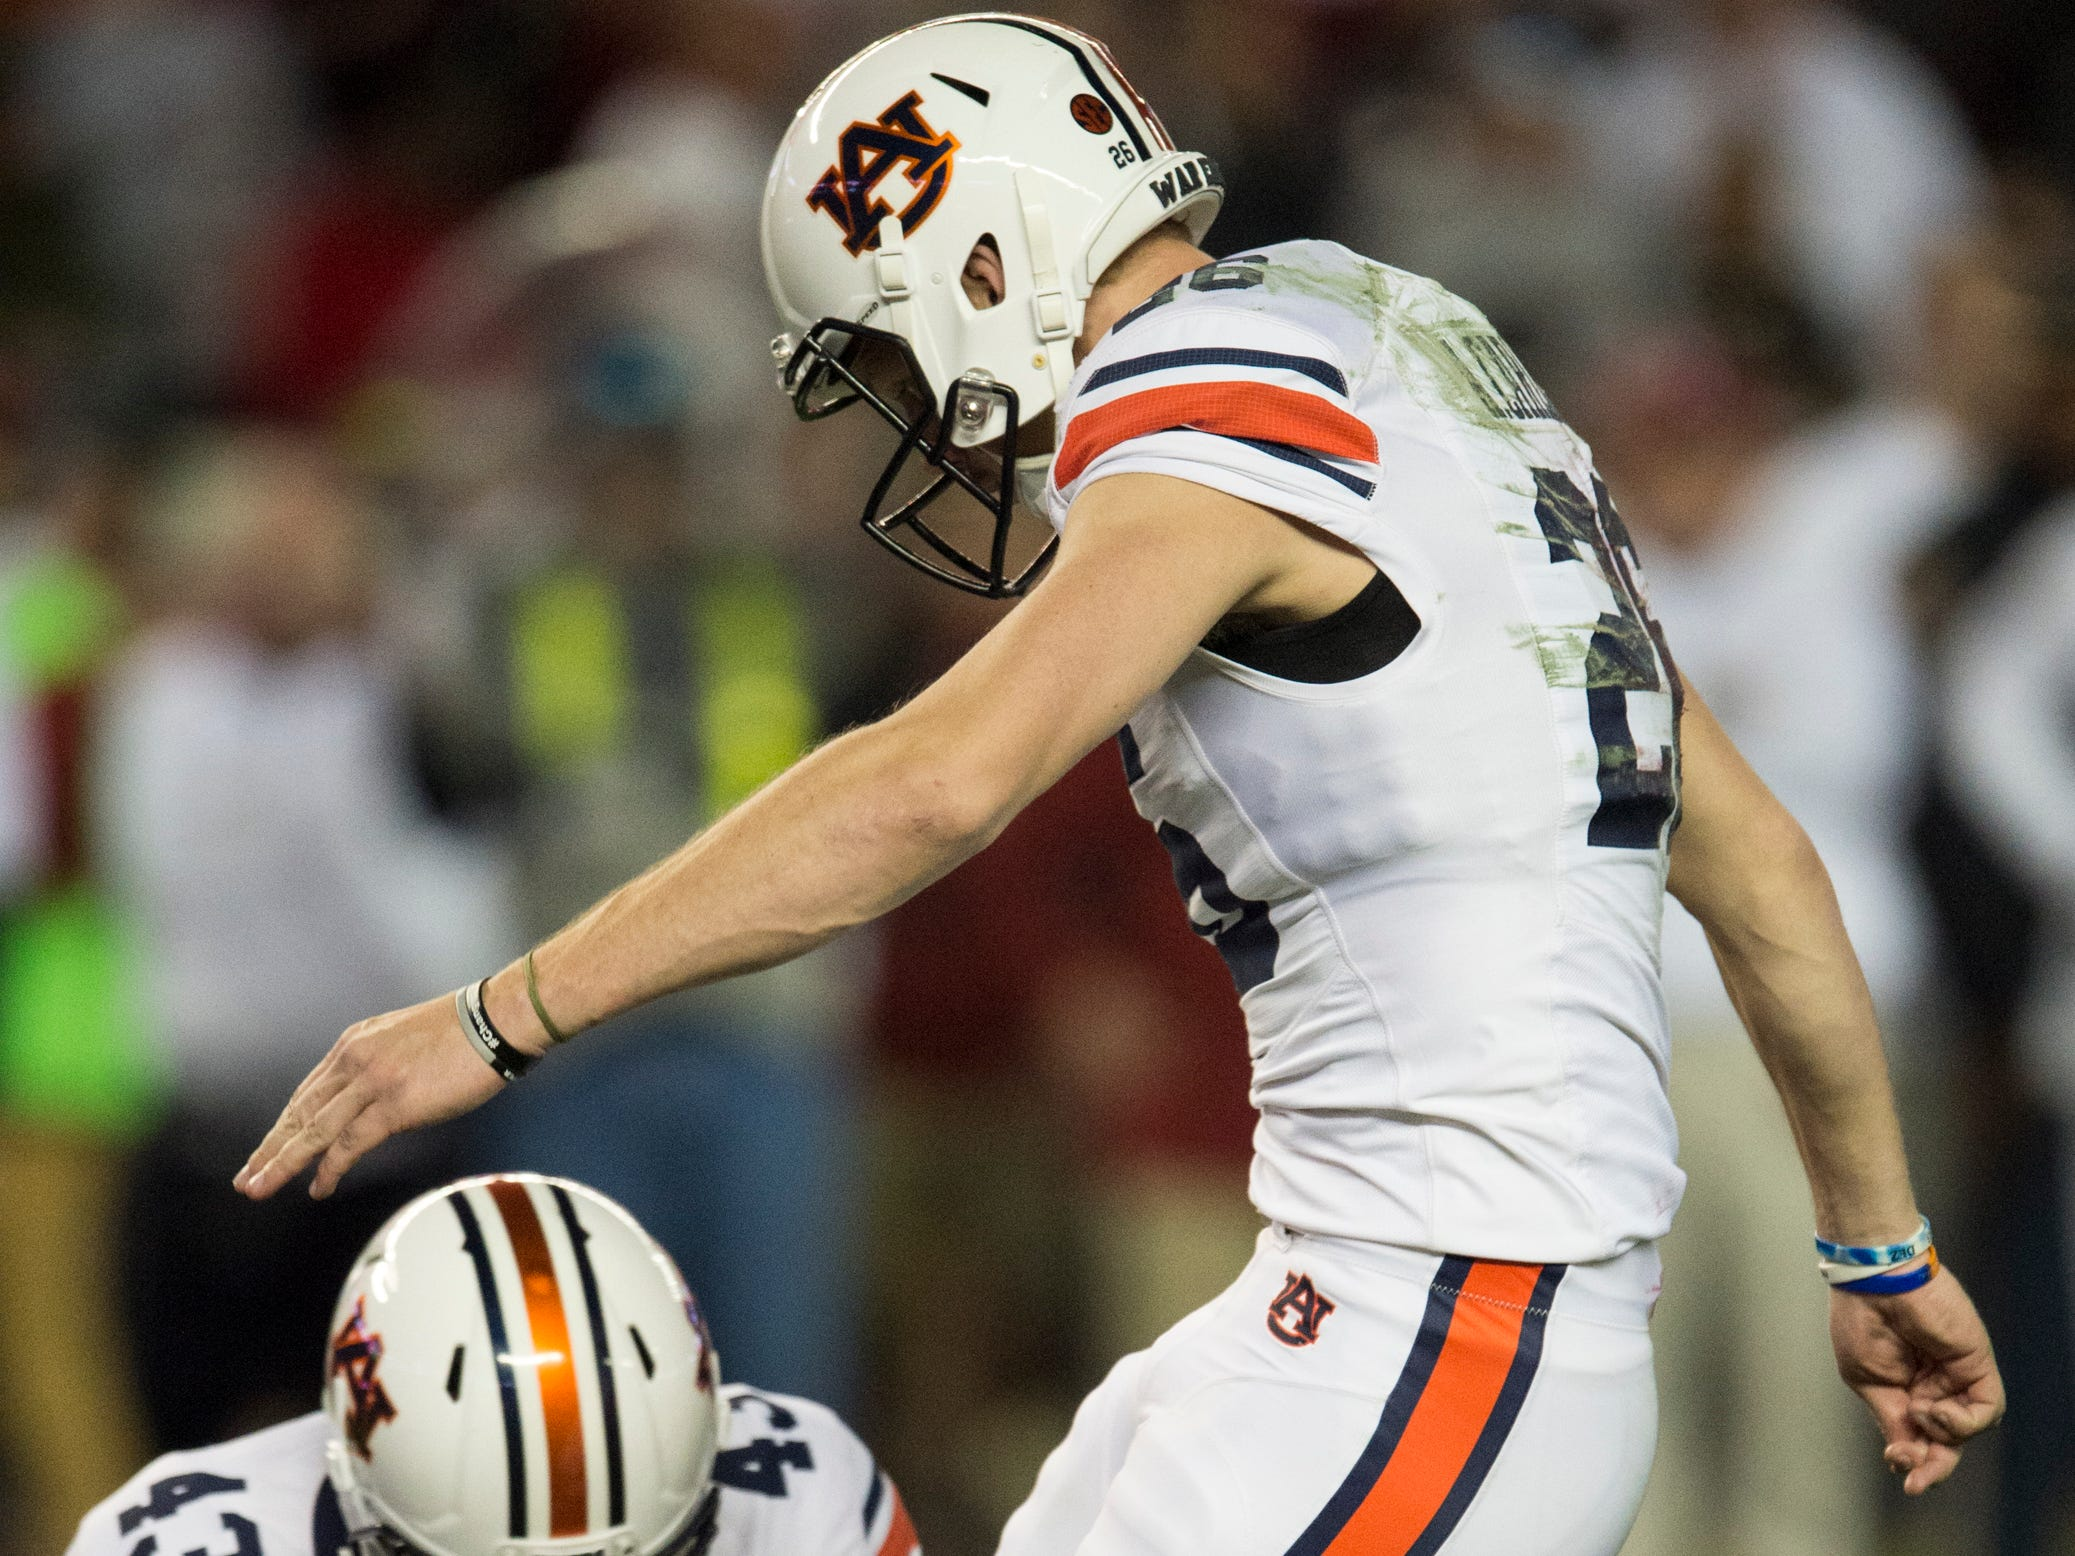 Auburn kicker Anders Carlson (26) kicks an extra point against Alabama during the Iron Bowl at Bryant-Denny Stadium in Tuscaloosa, Ala., on Saturday, Nov. 24, 2018. Alabama defeated Auburn 52-21.